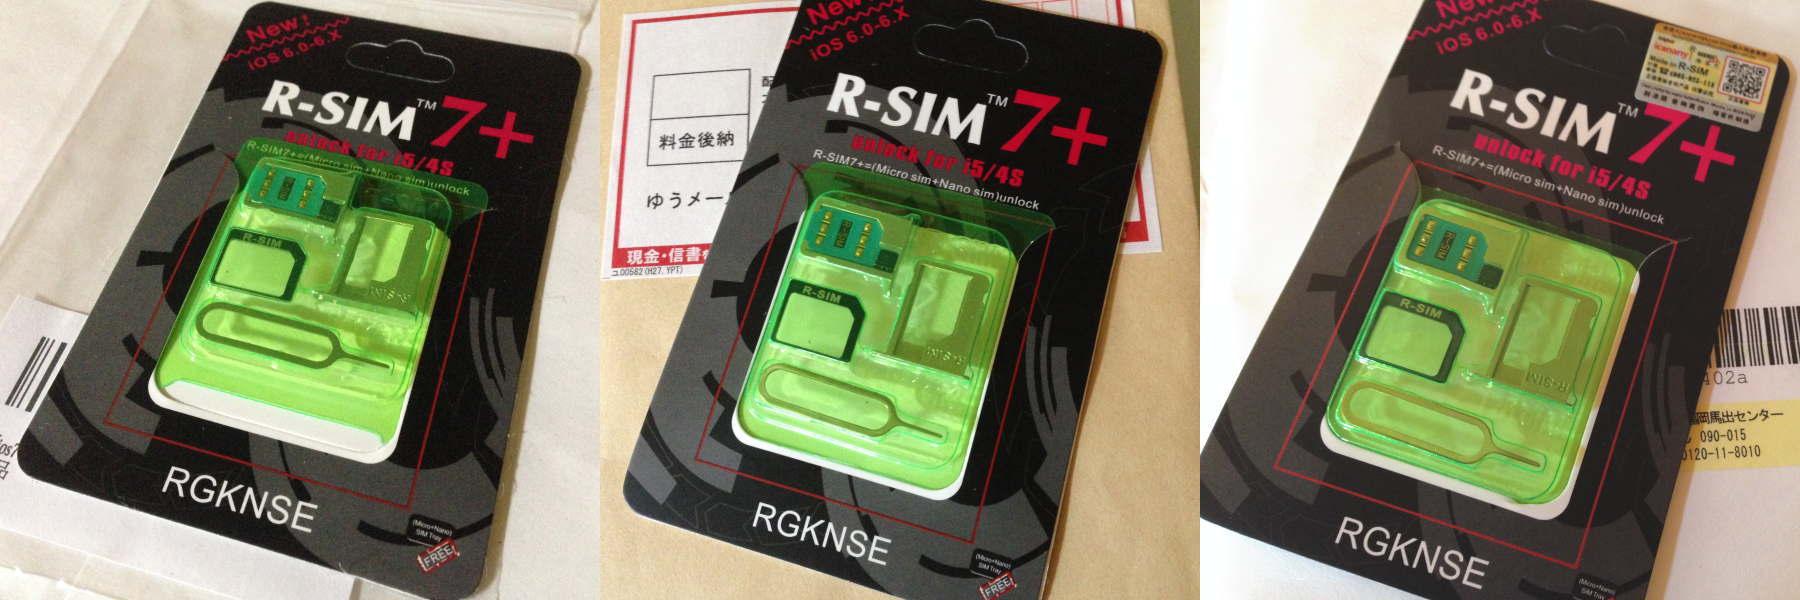 SIM下駄「R-SIM7+」偽物・偽物・本物